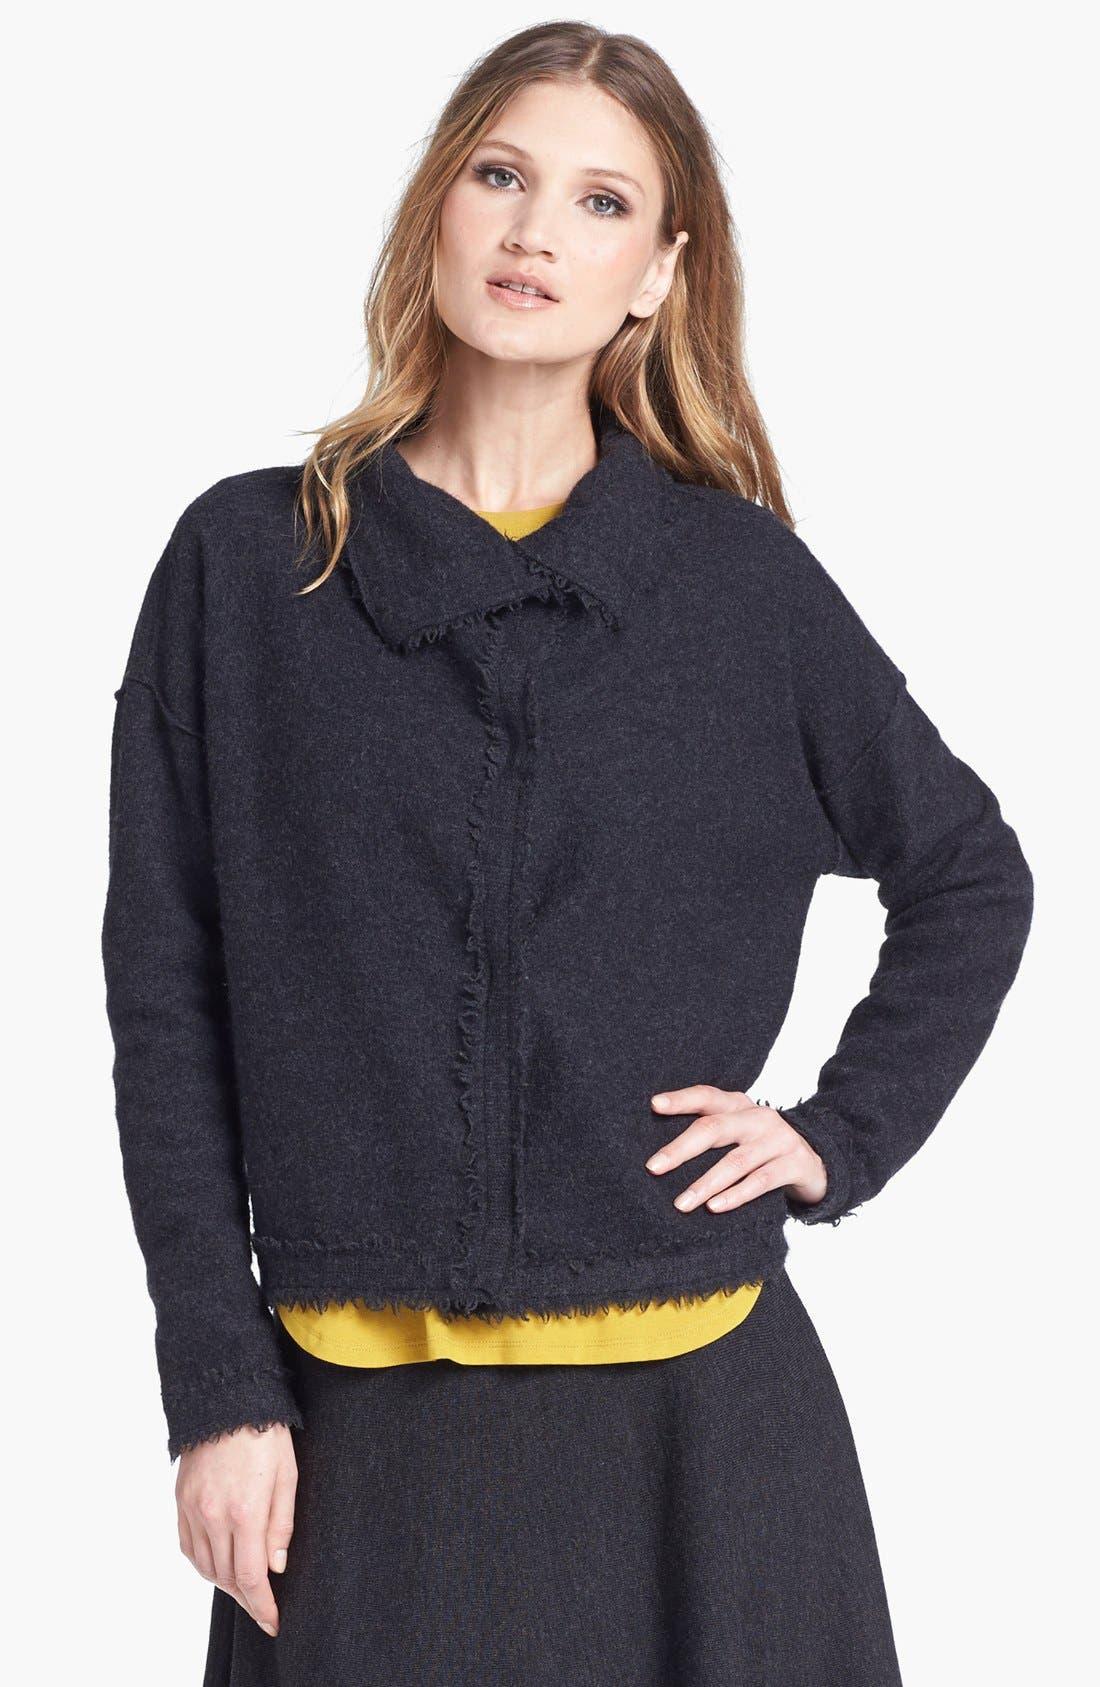 Alternate Image 1 Selected - Eileen Fisher Boiled Wool Jacket